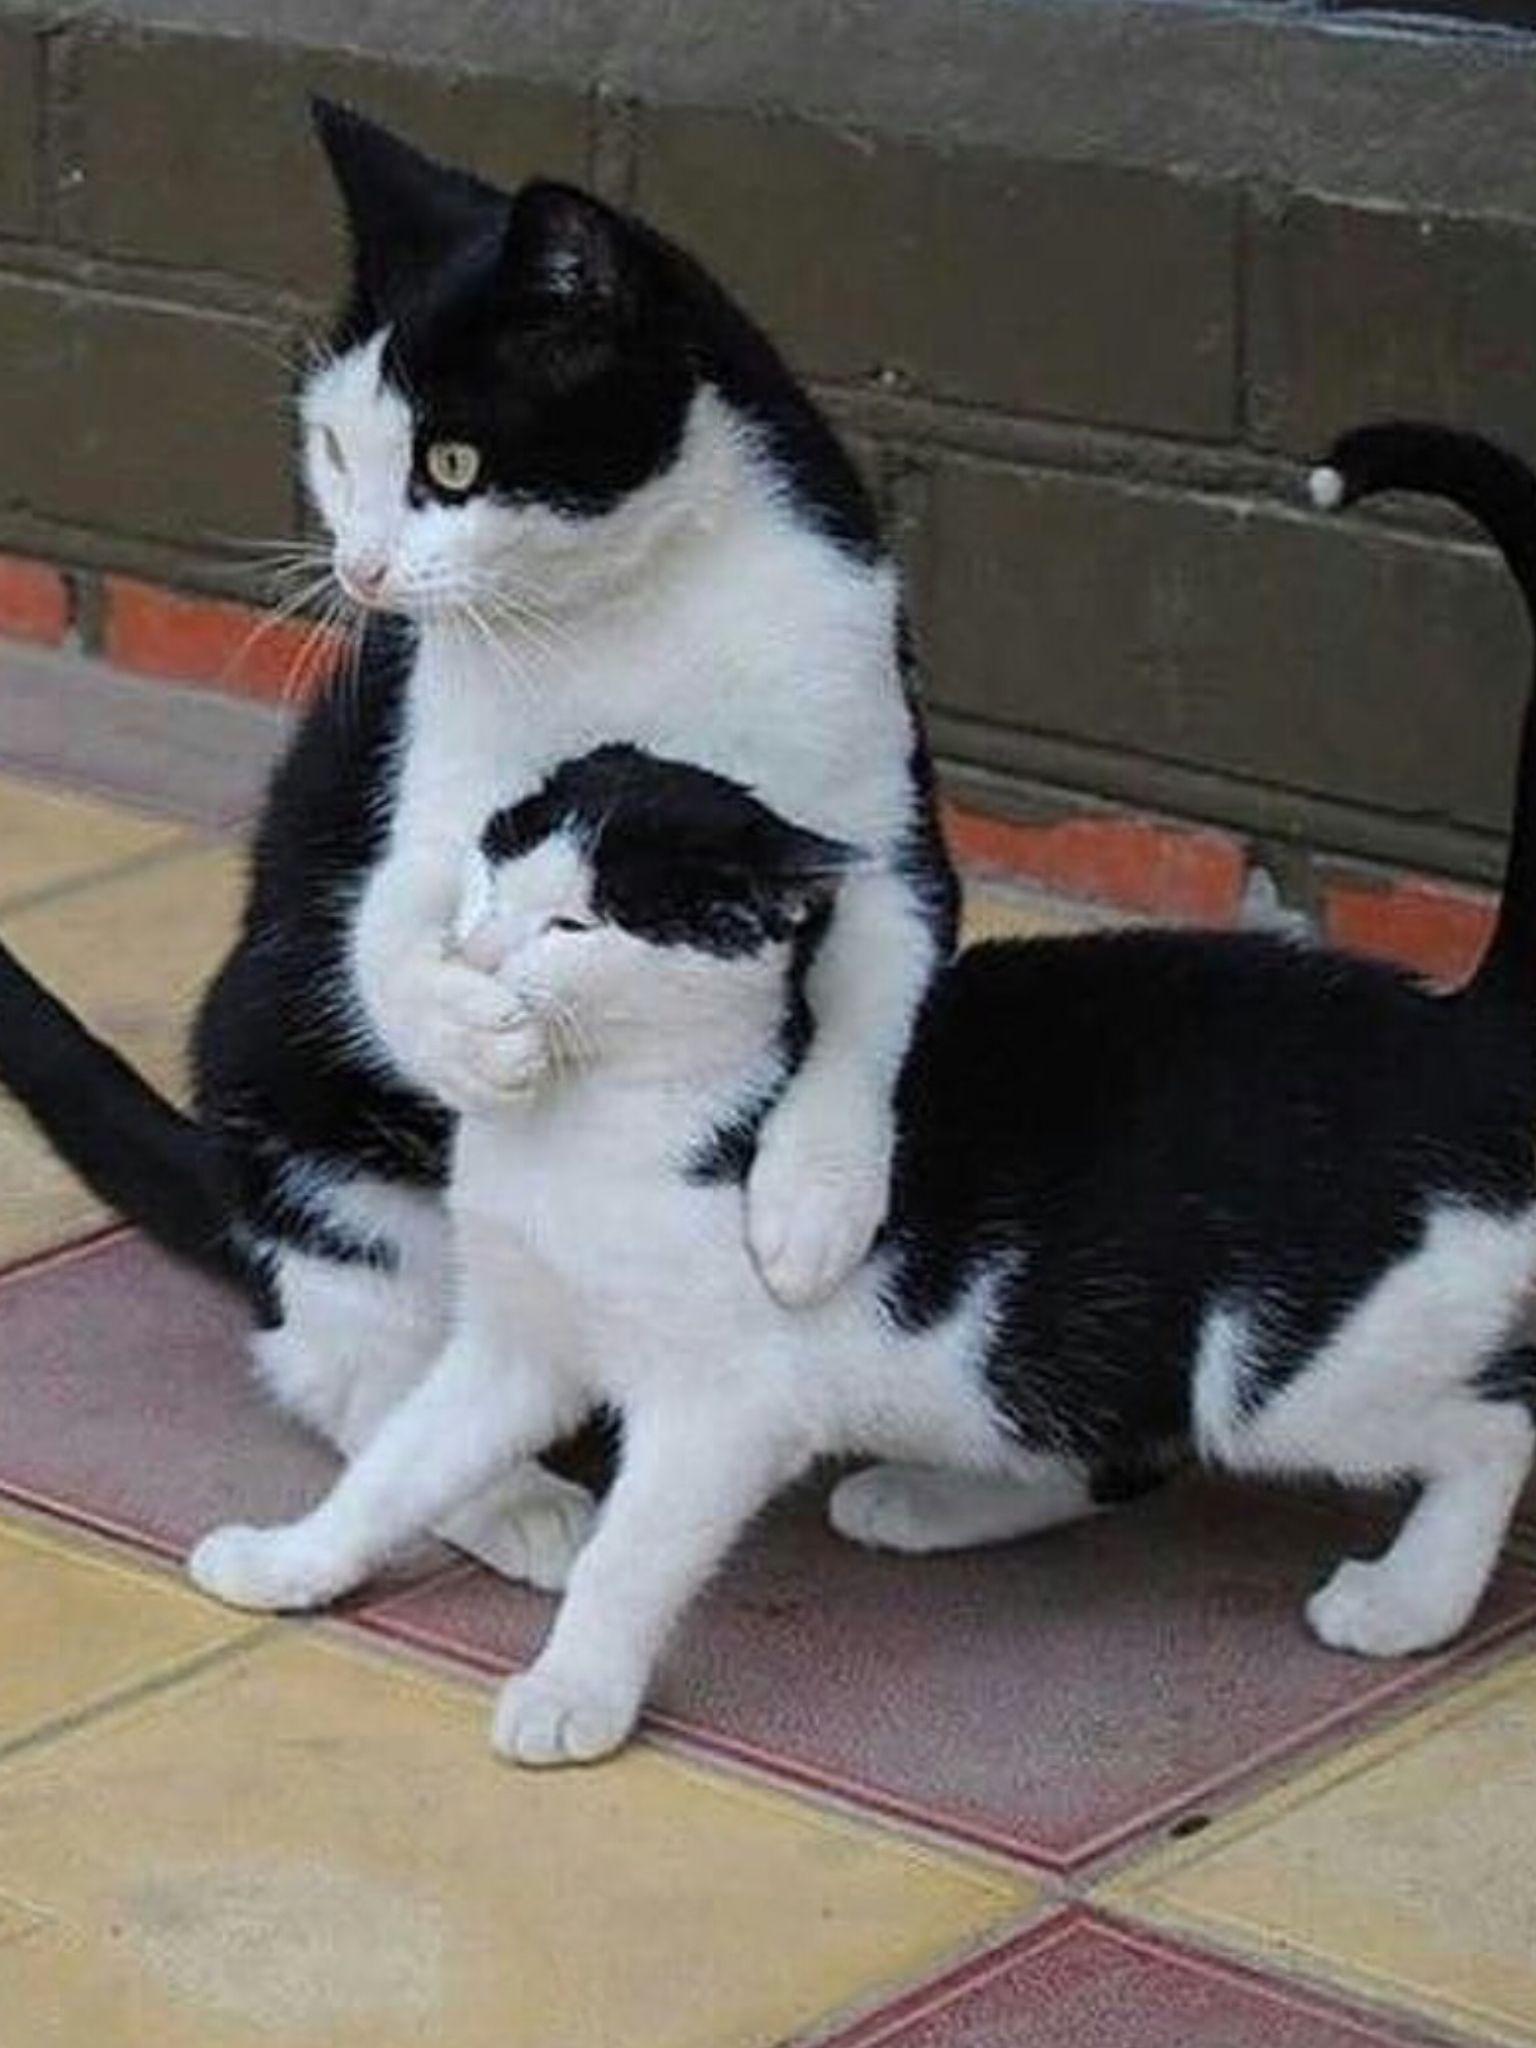 Sssssshhhhhhhhhhhhhhhhhhhhhhh It Is Coming Baby Cats Cute Baby Cats Cute Cats